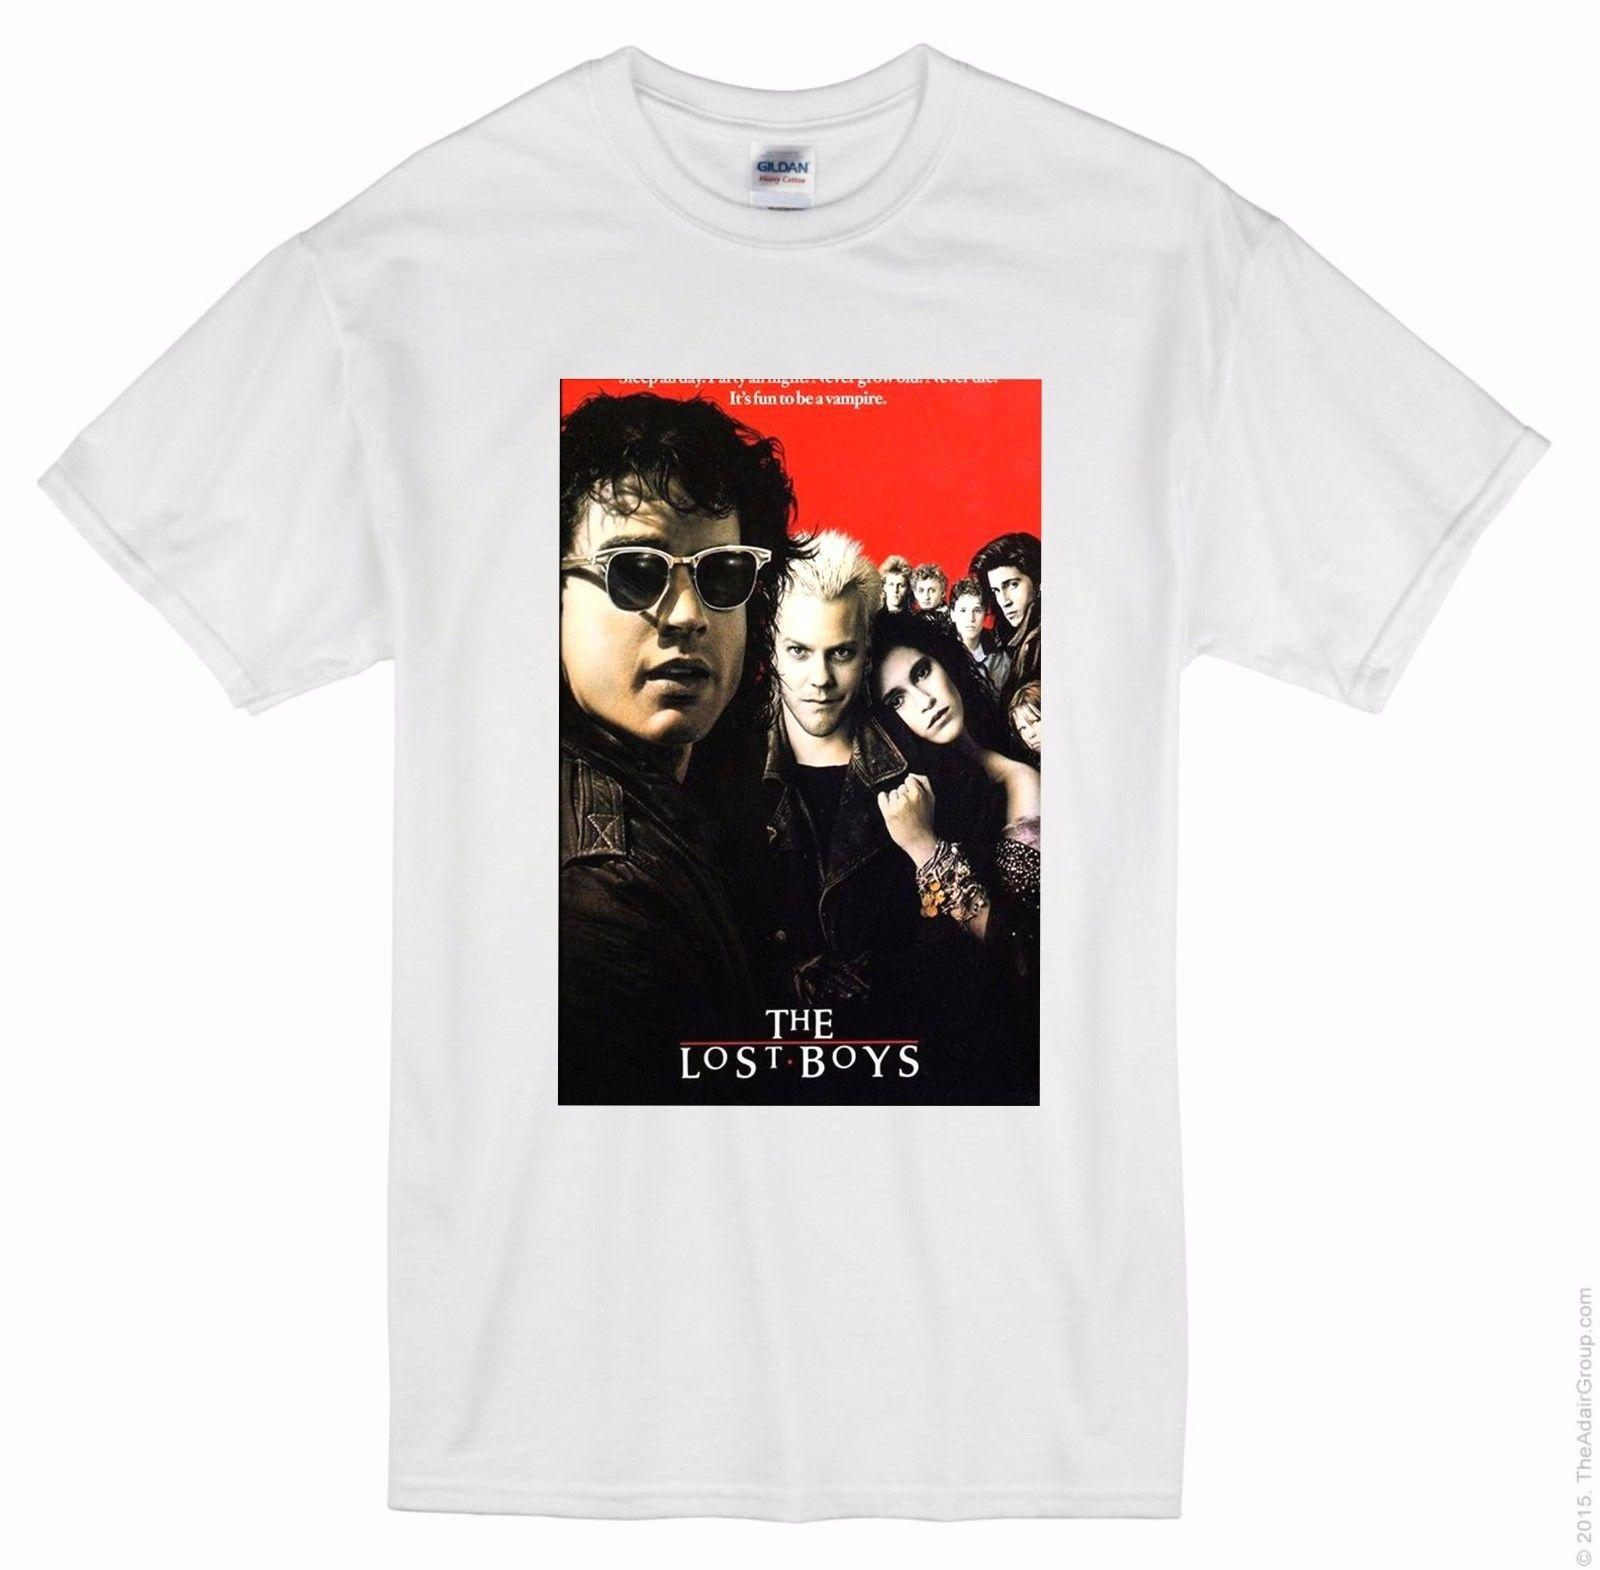 896f9fe56 THE LOST BOYS 1987 MOVIE T Shirt Film Cinema Wall Home Posters 2018 Fashion T  Shirt Fashion Style Men Tee T Shirt Printing Cool Tee Shirts Cheap Business  ...